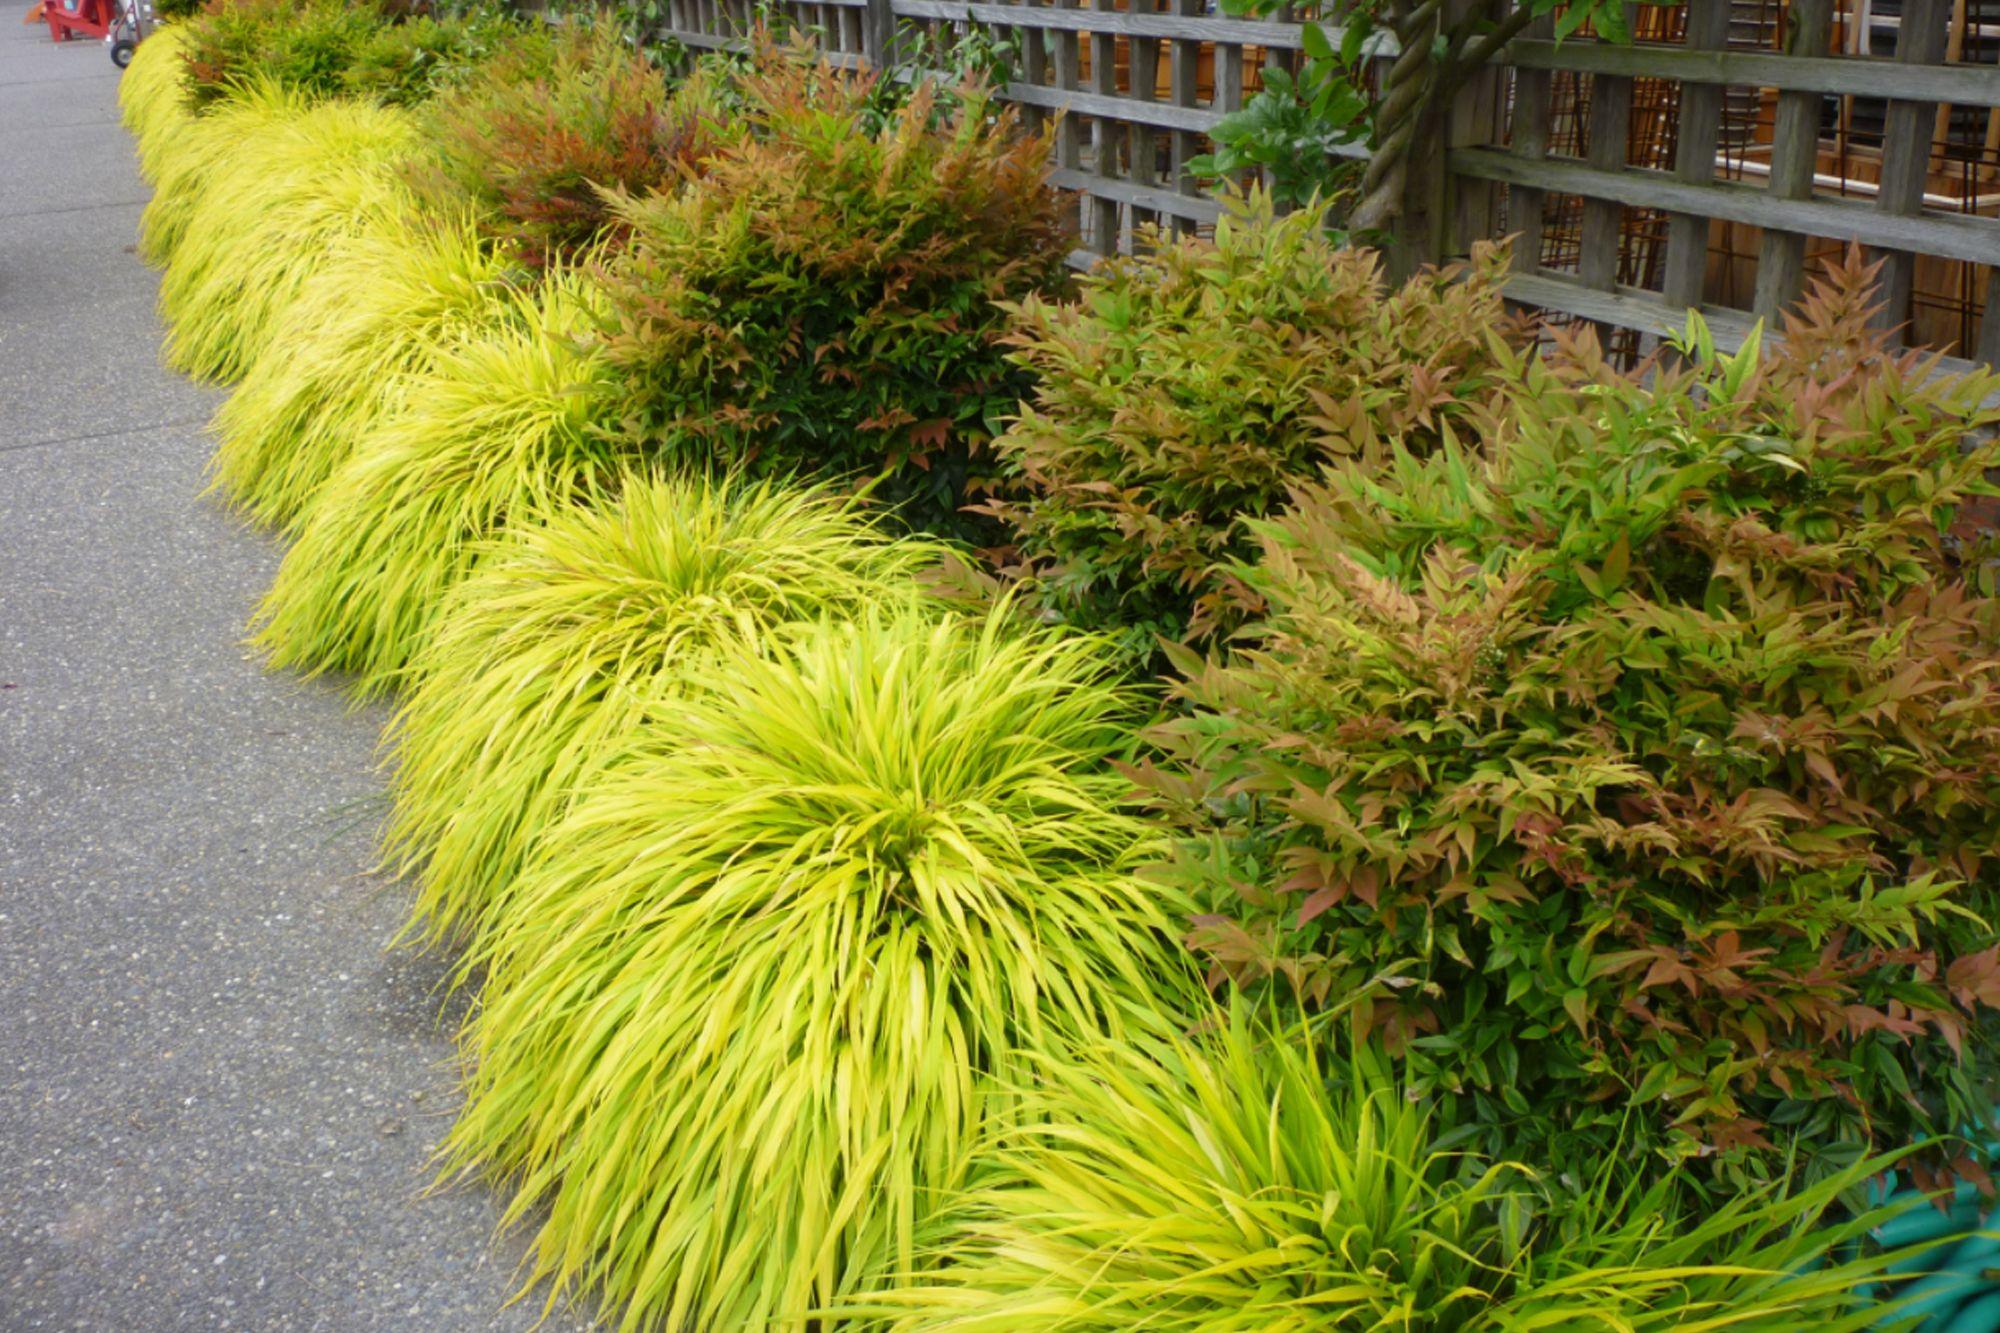 Mahoneys Garden Center - Using Ornamental Grasses In The Landscape